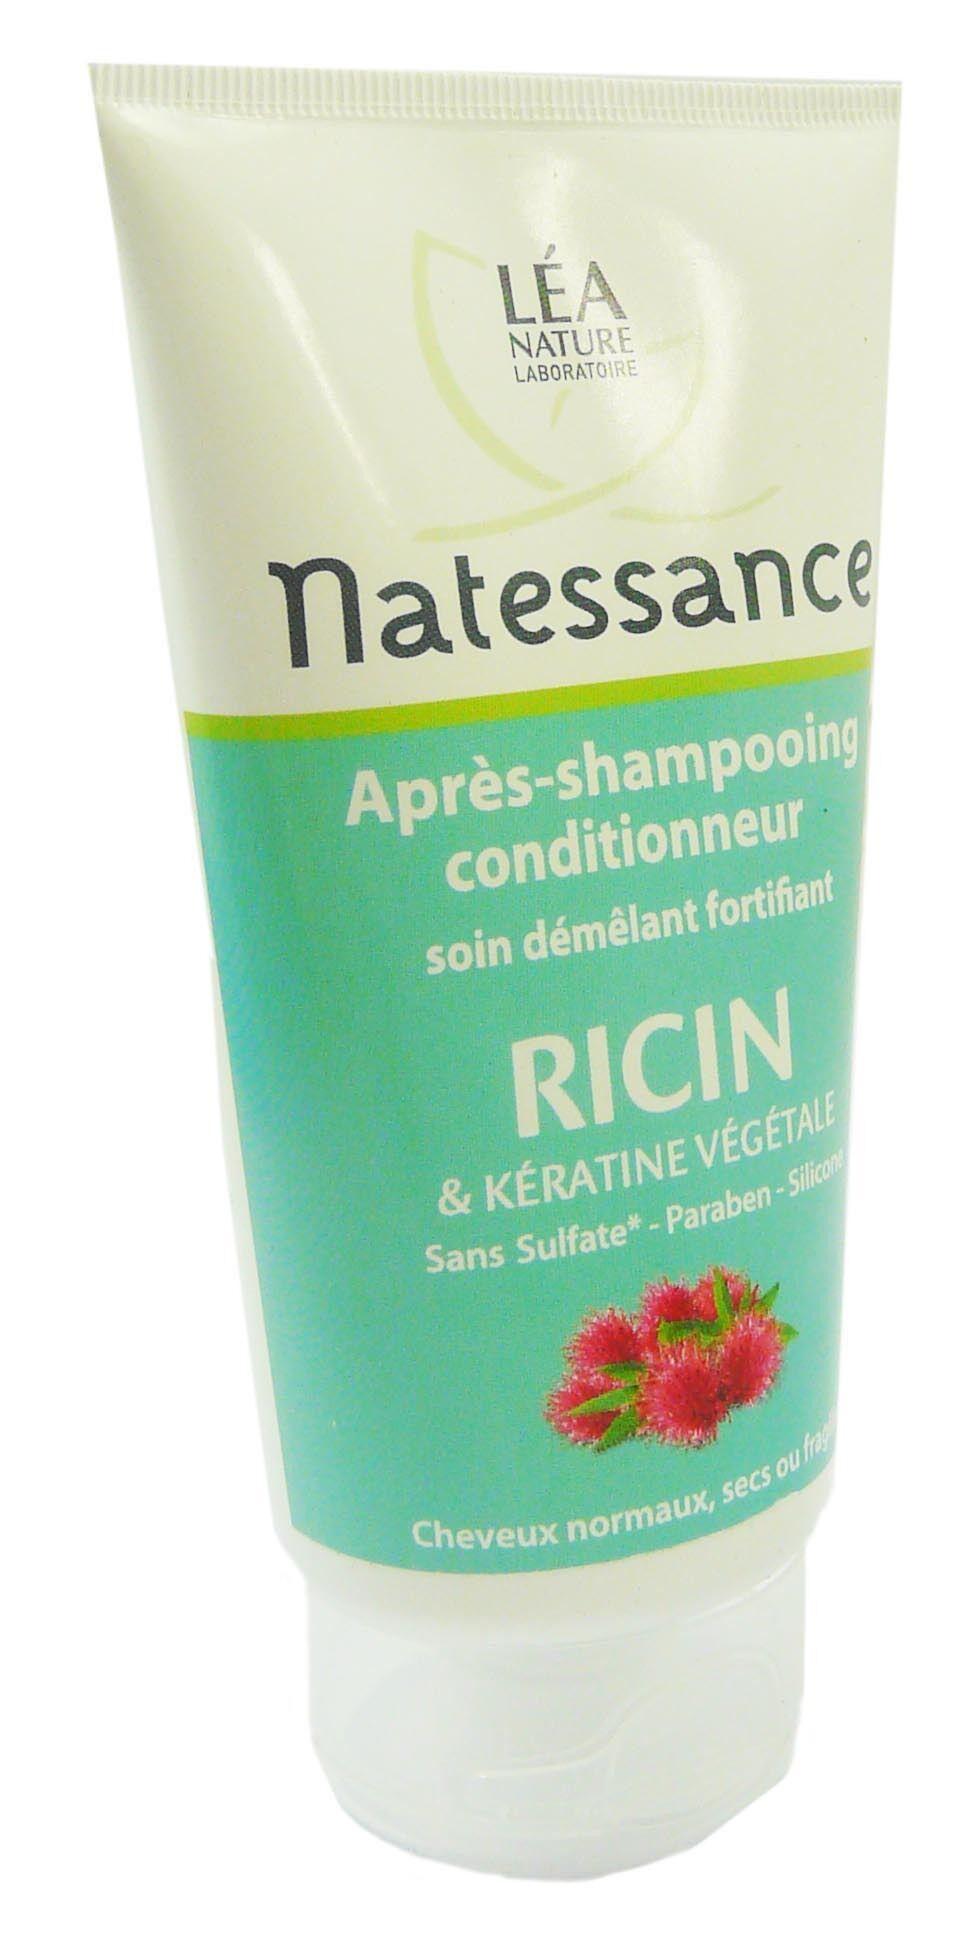 Natessance apres-shampooing a l'huile de ricin 150ml